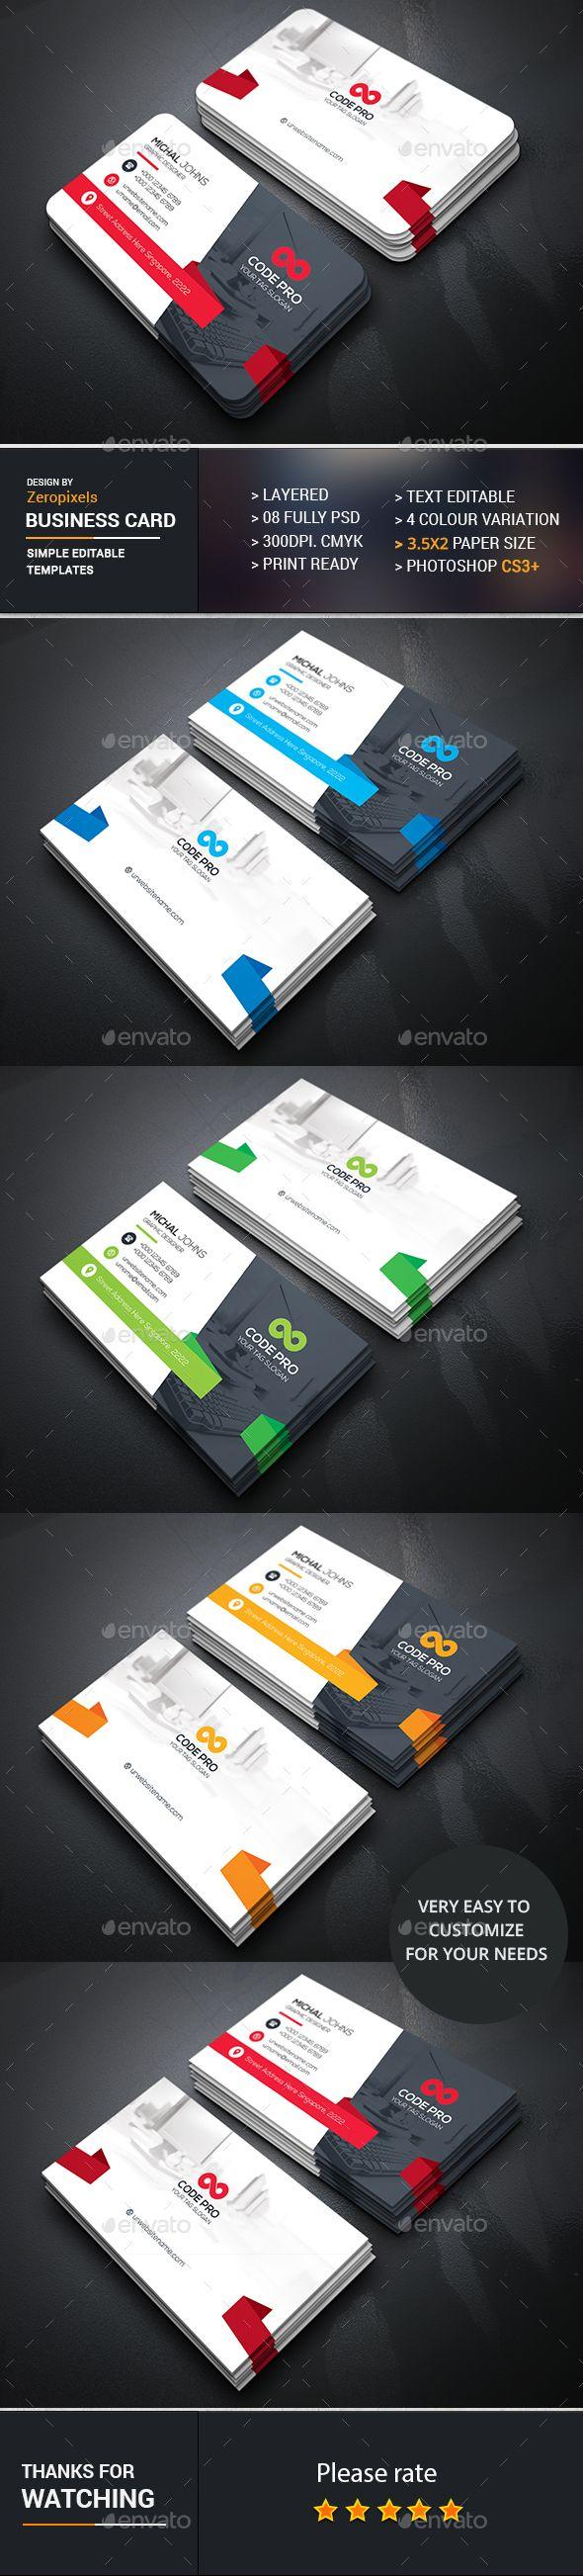 23 melhores imagens sobre business no pinterest logos pastor e business card template psd download here httpsgraphicriver reheart Choice Image